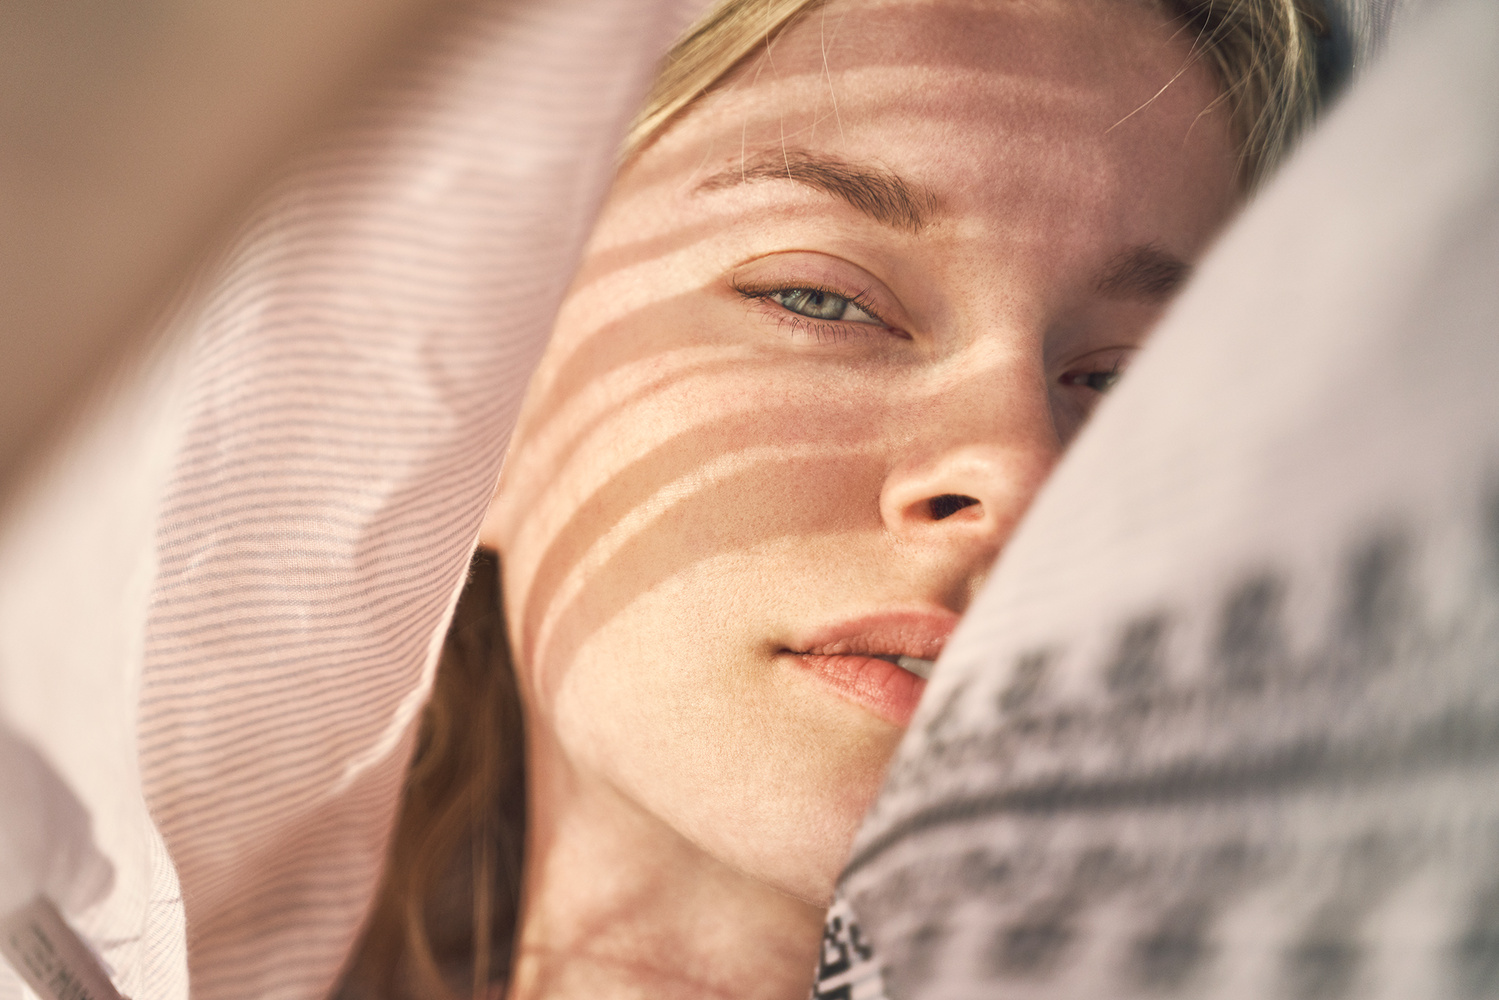 Good morning by Karl-Filip Karlsson